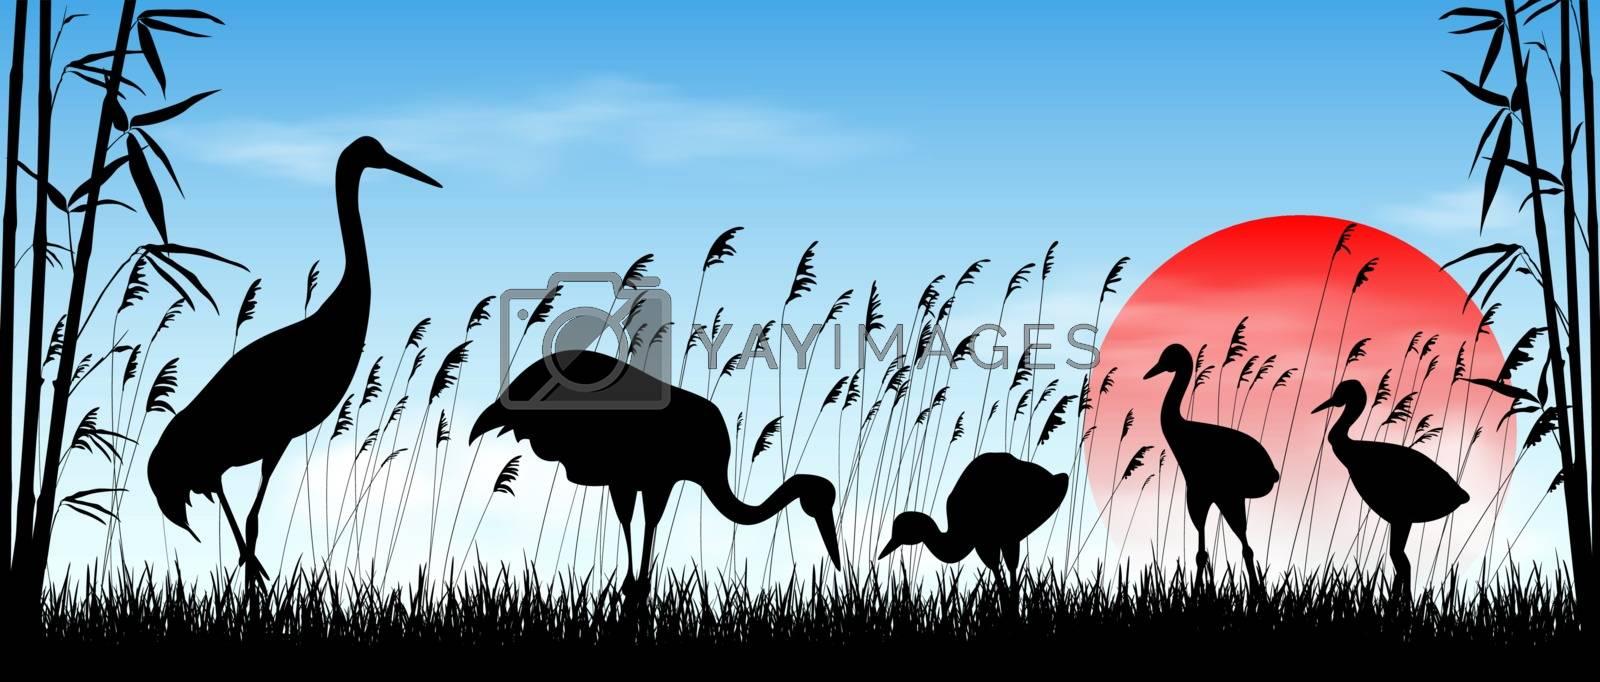 Birds cranes on sunrise background. Morning, sky, sun. Birds on a background of grass, bamboo and reeds. Evening landscape. Wildlife scene.